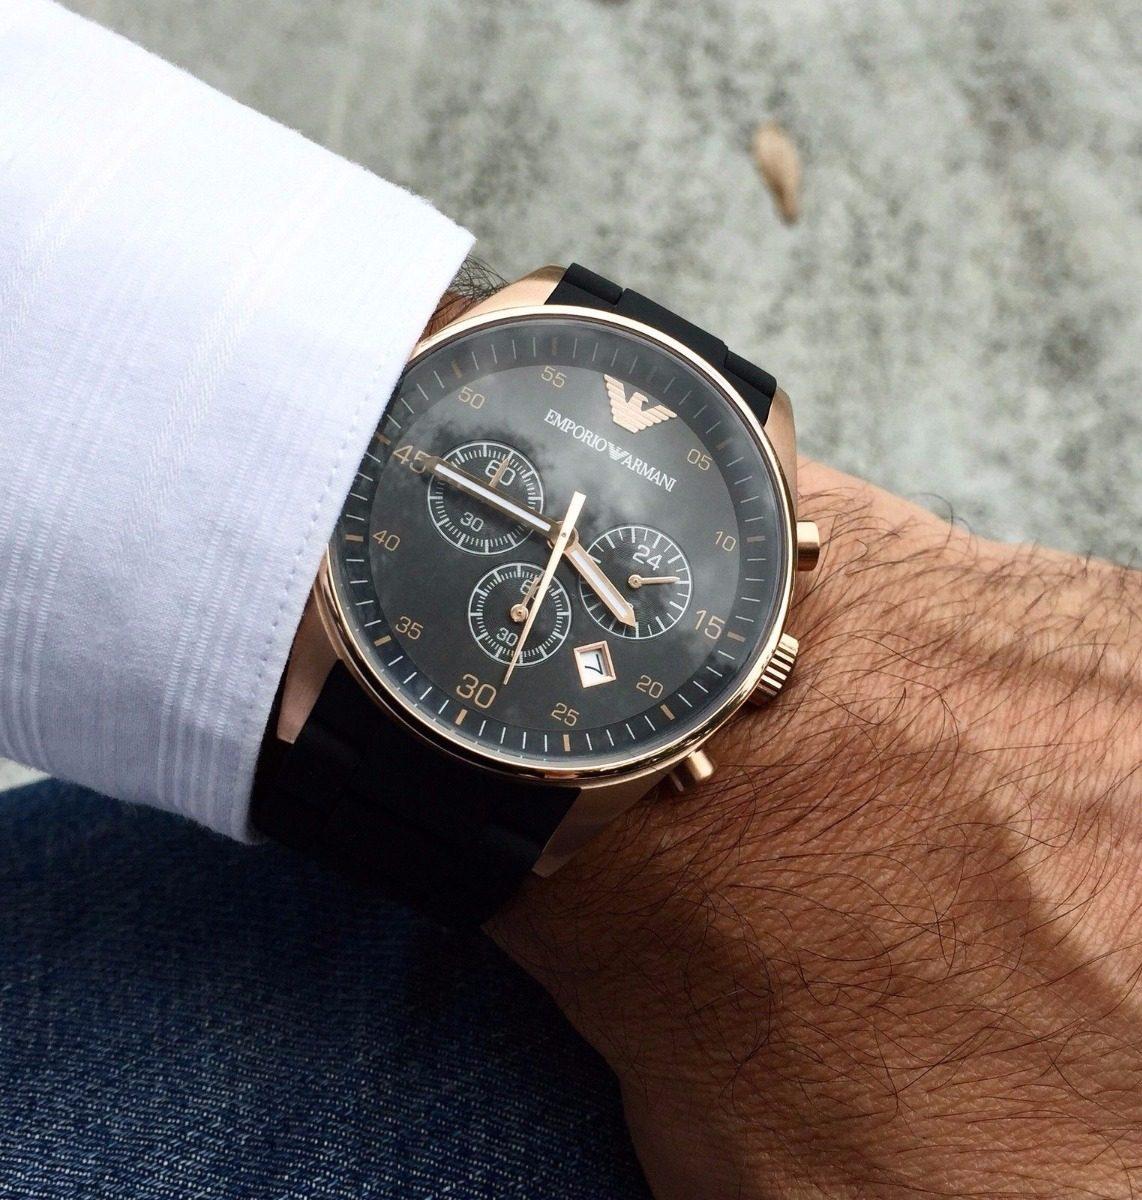 3ae2c7b4c59 Relógio Emporio Armani Ar5905 Masculino Original Preto Rose - R  334 ...